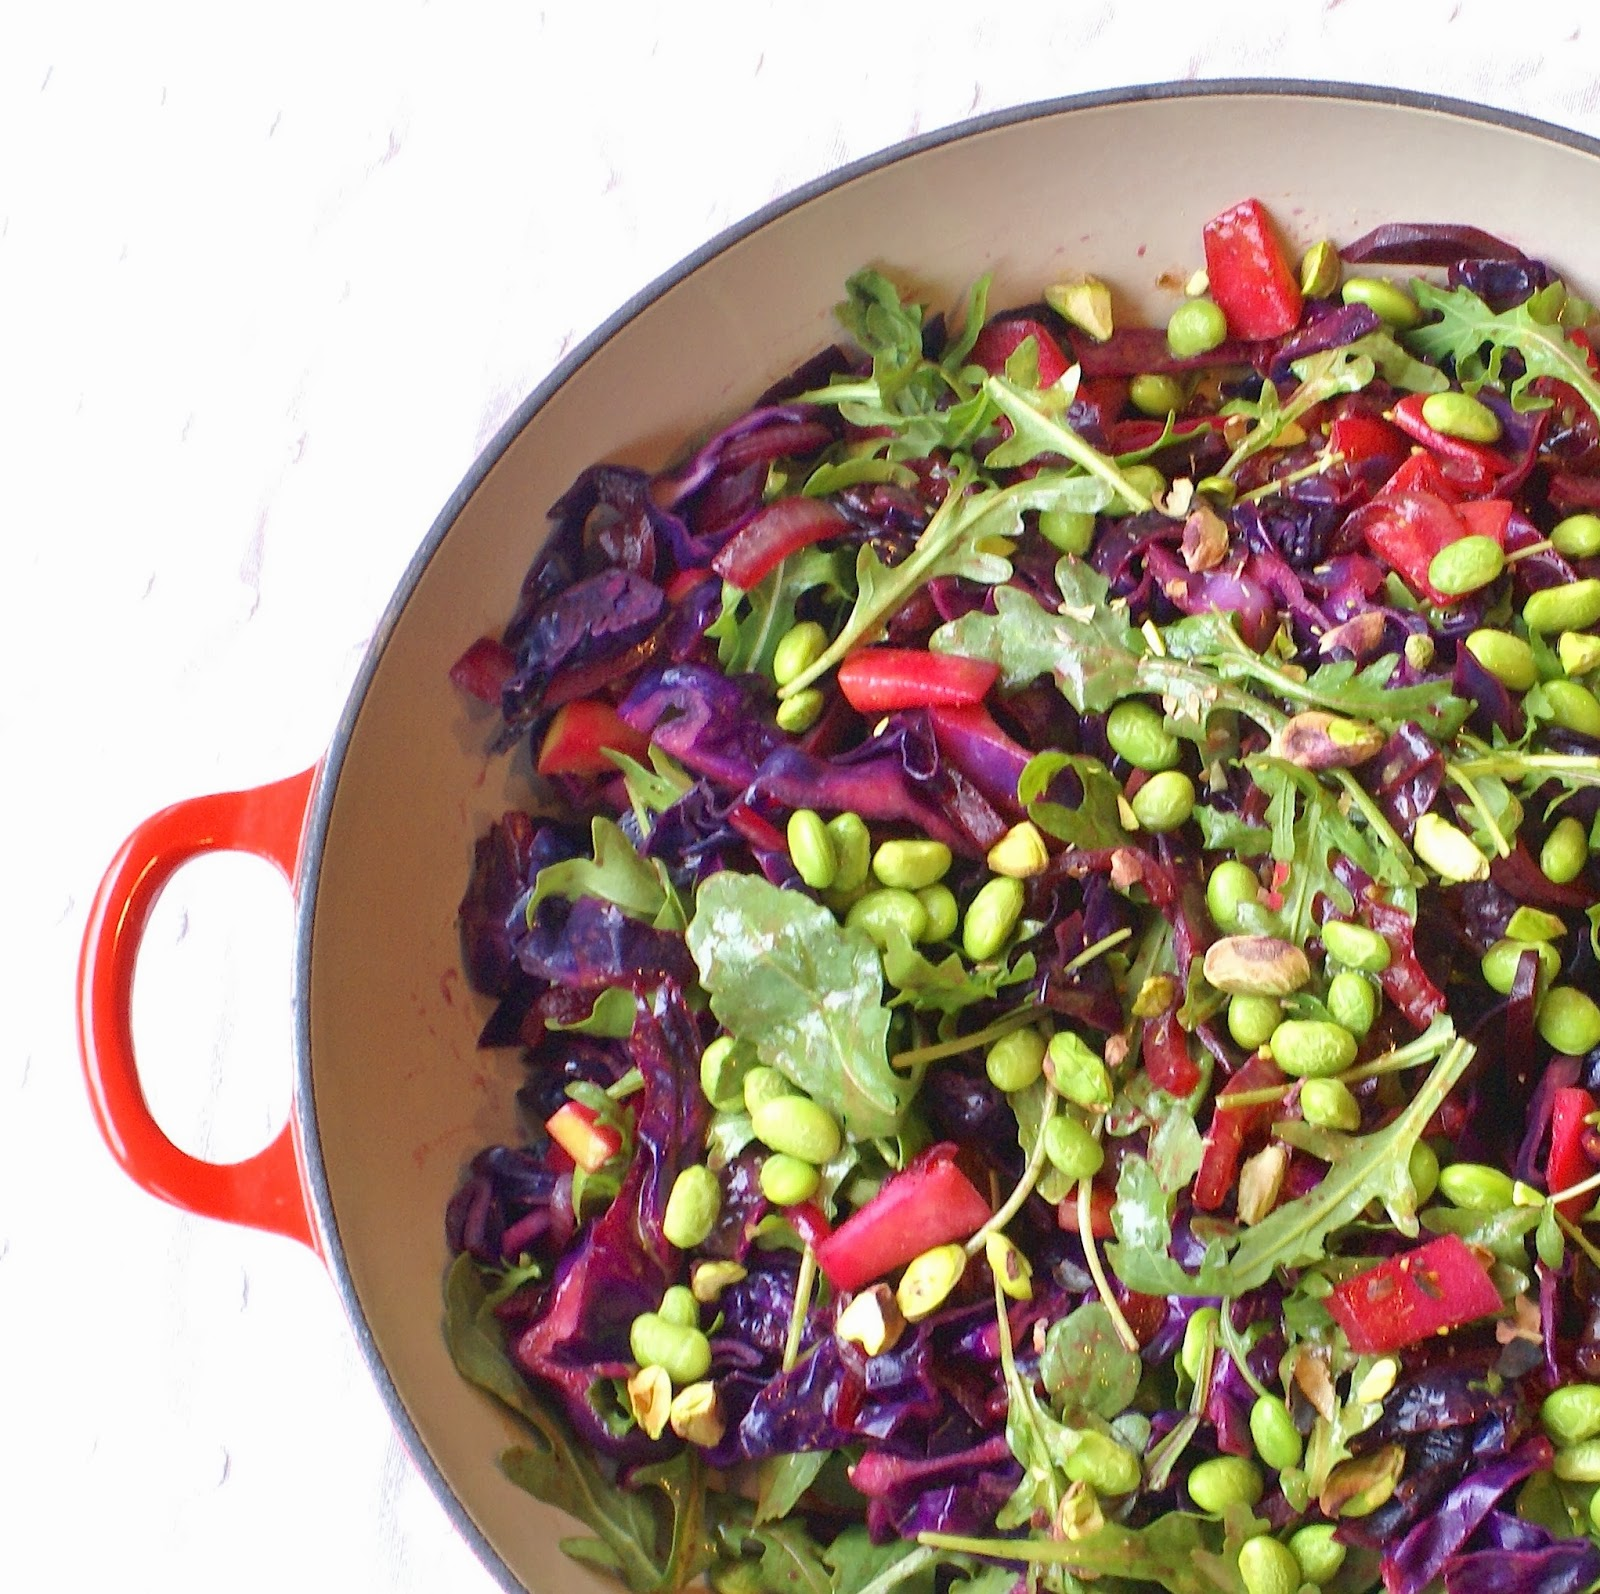 ... beet salad croutons red beet salad tomato beet salad beet and feta